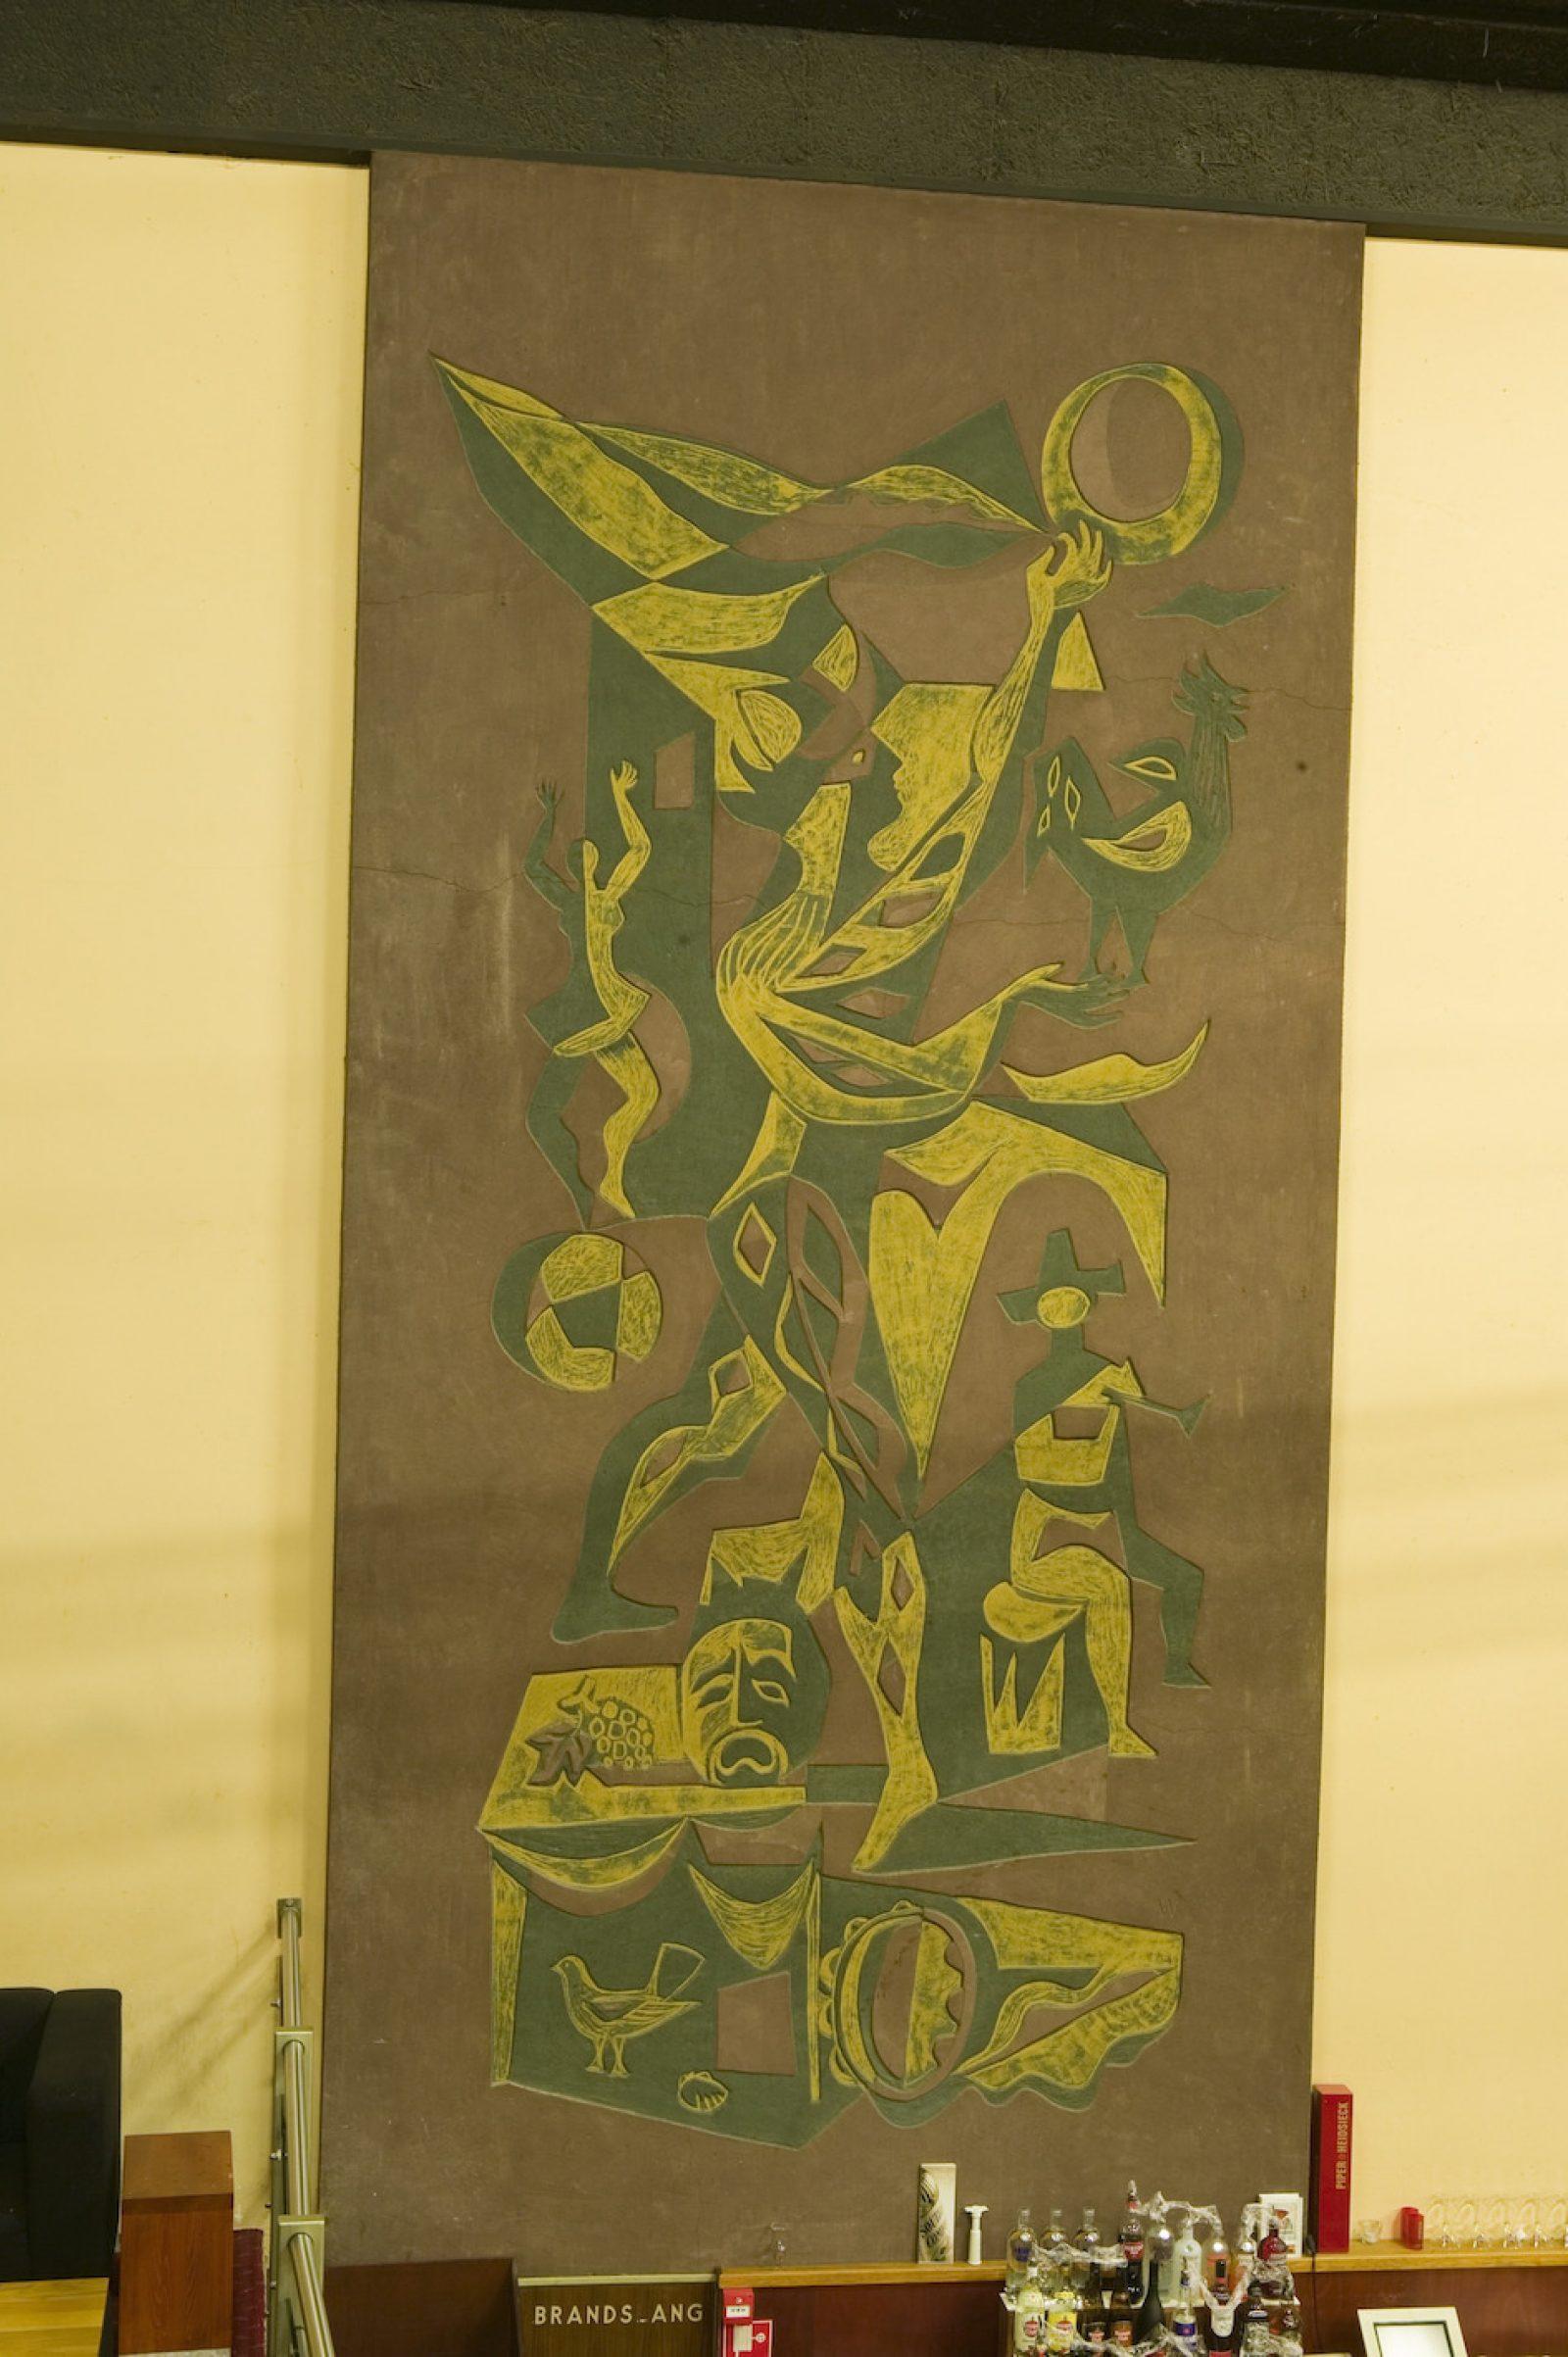 2007 Thalia schilderij Kris Roderburg 526478